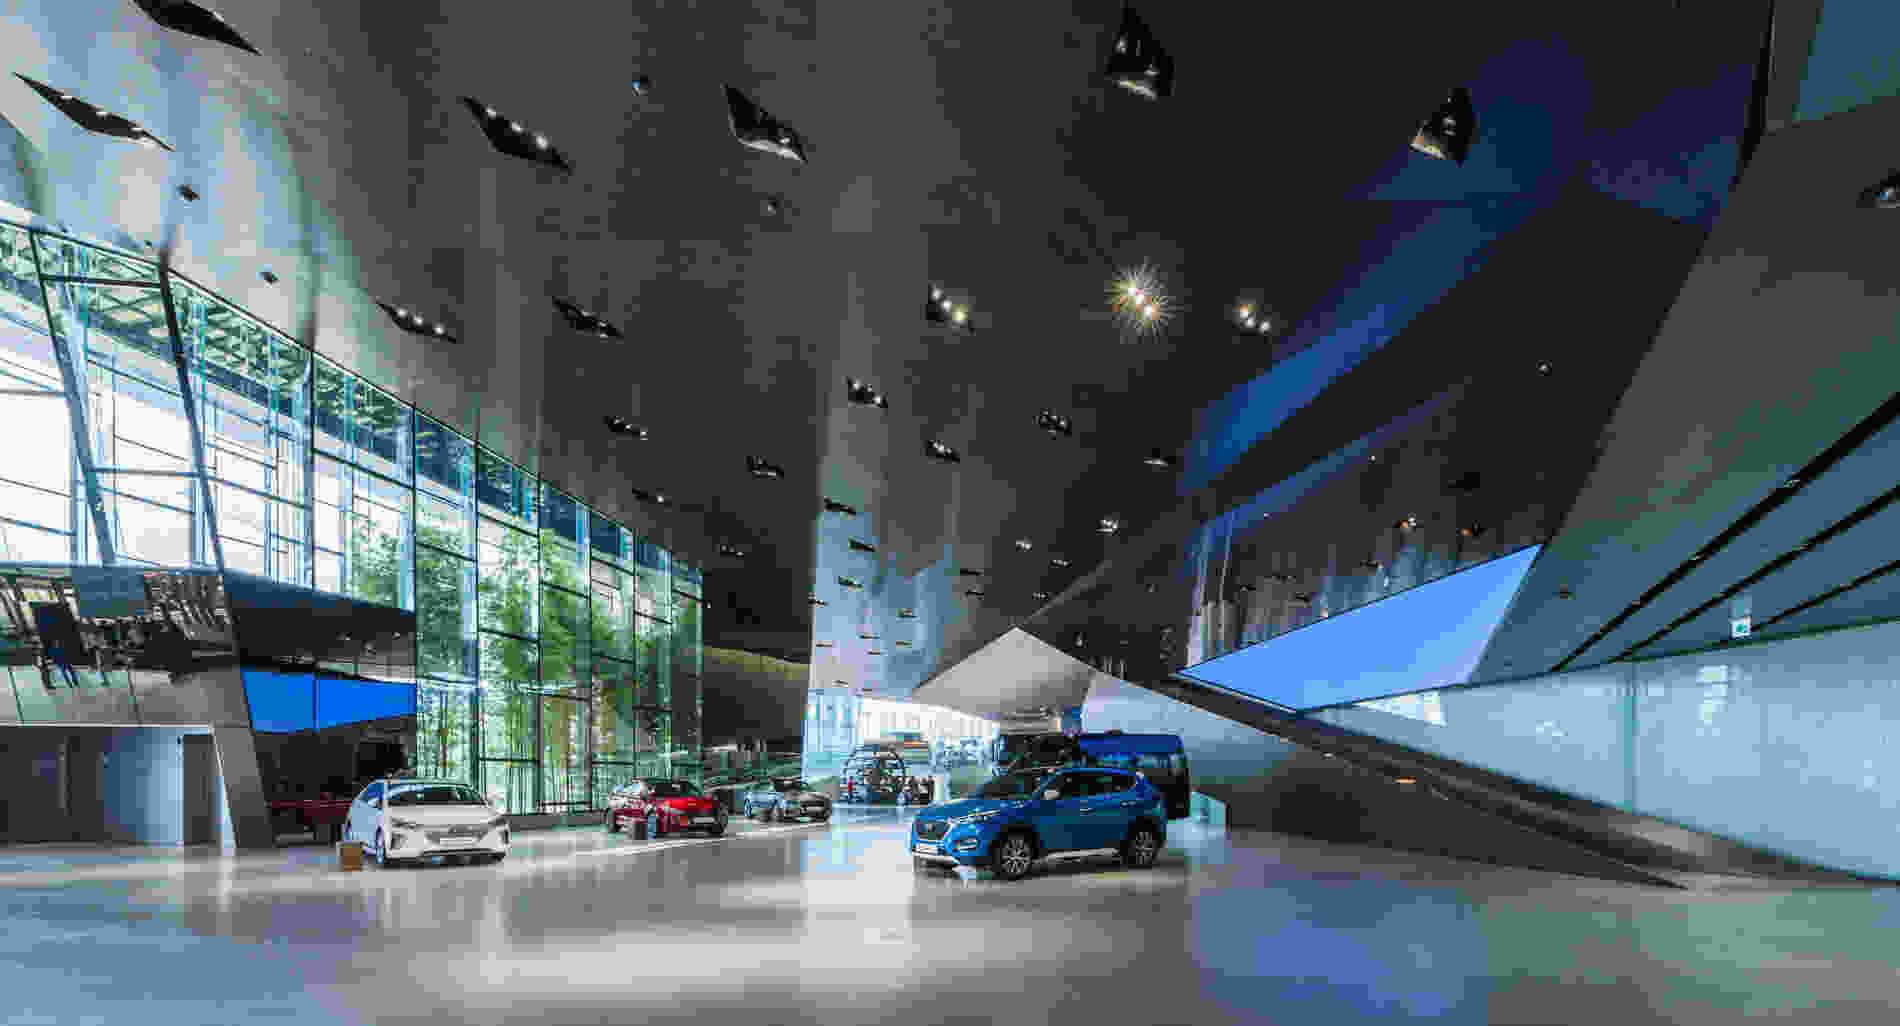 257 Hyundai Motorstudio Goyang Katsuhisa Kida 114 show room